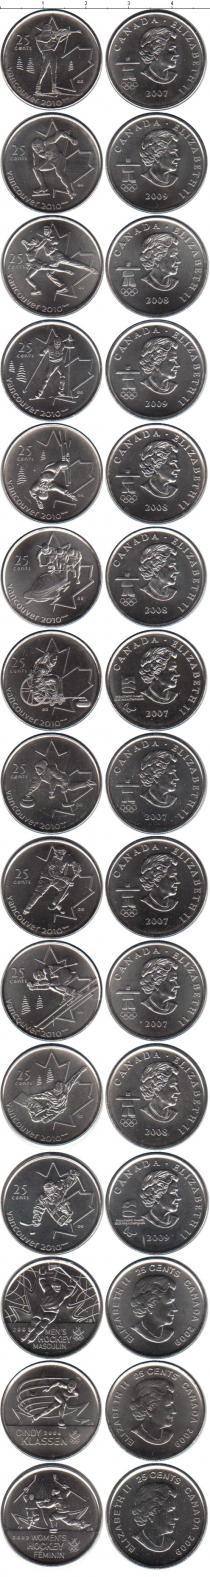 Каталог - подарочный набор  Канада Канада 2009